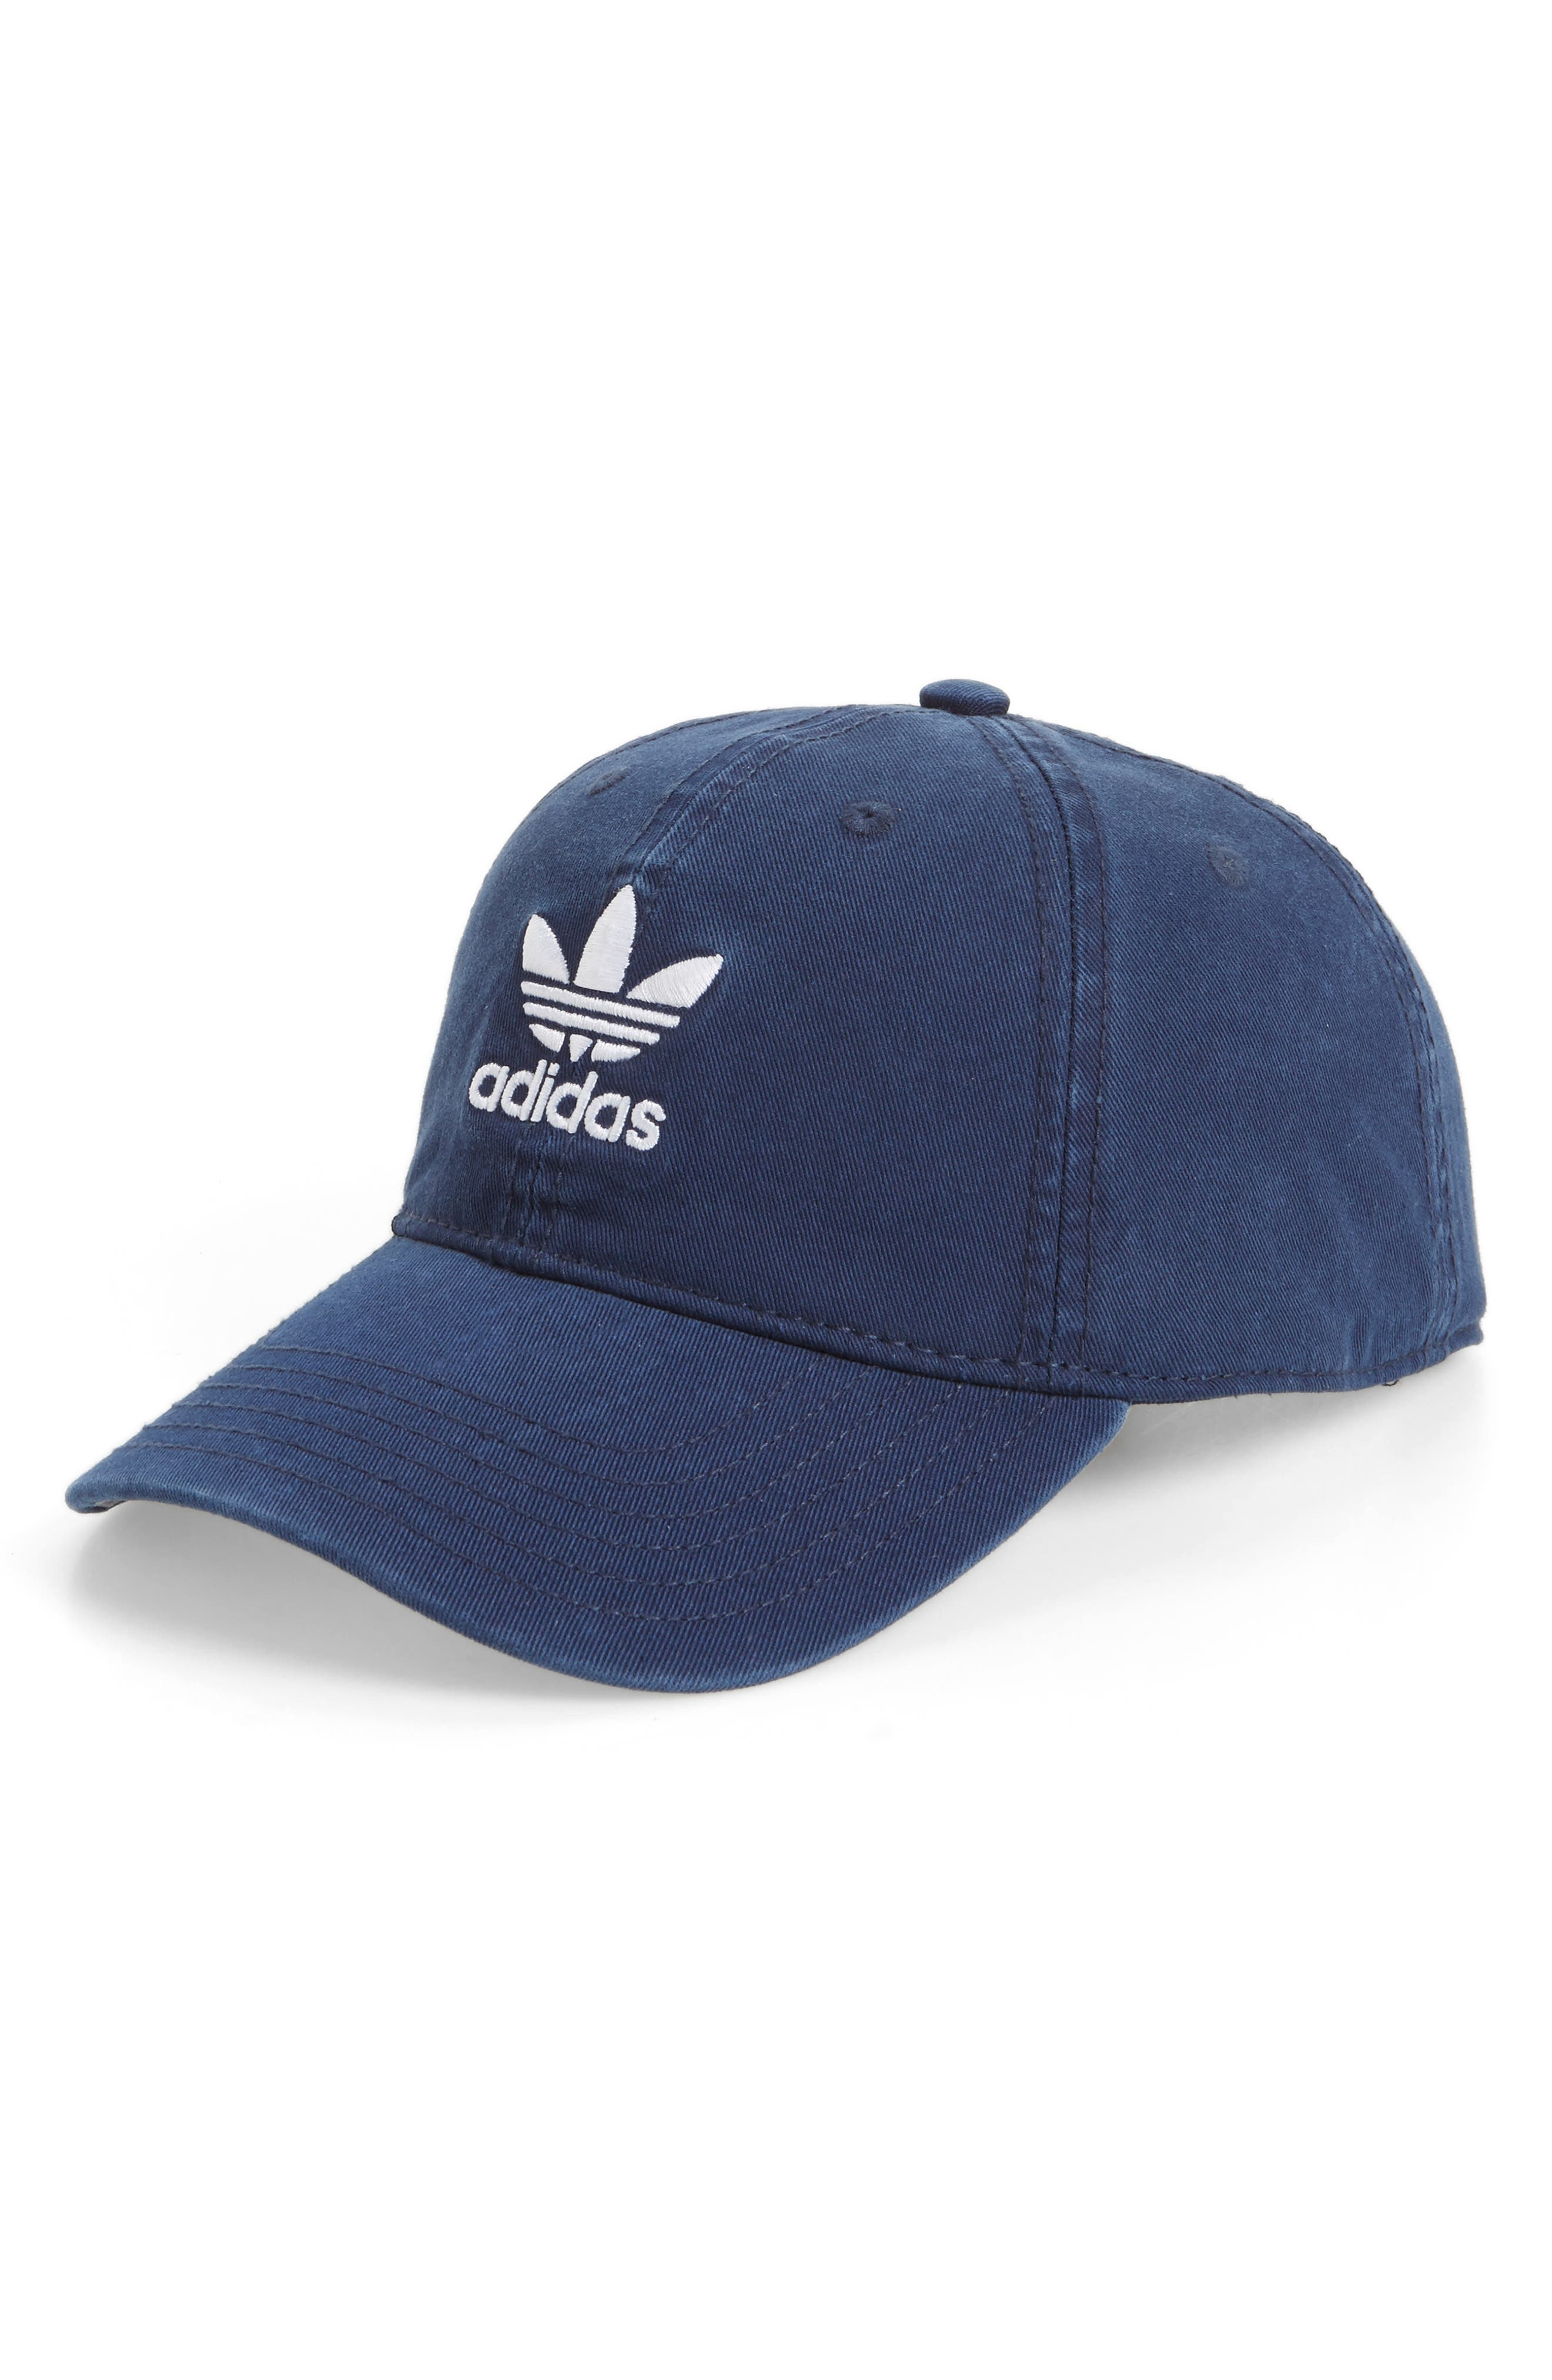 Adidas Originals Men S Originals Precurved Washed Strapback Hat ... e4bbea1a8c31